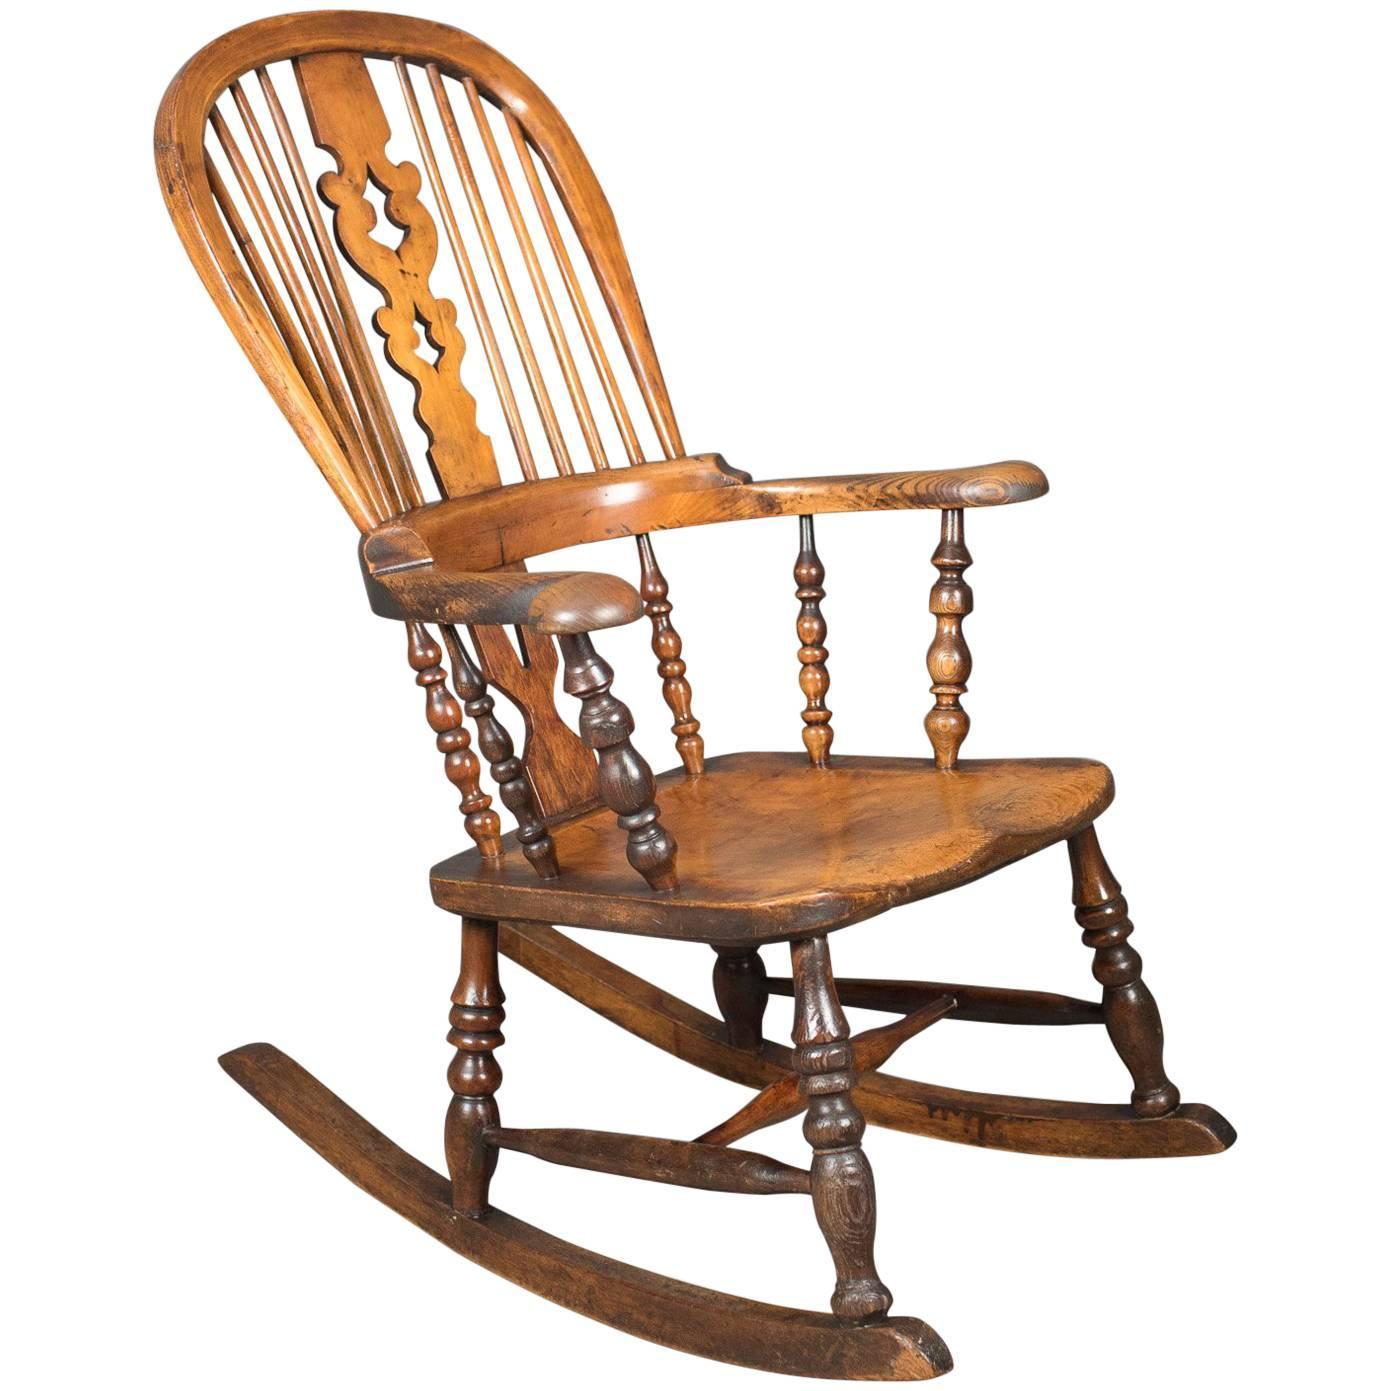 Victorian Antique Windsor Rocking Chair, English Armchair, Yorkshire, Circa  1850